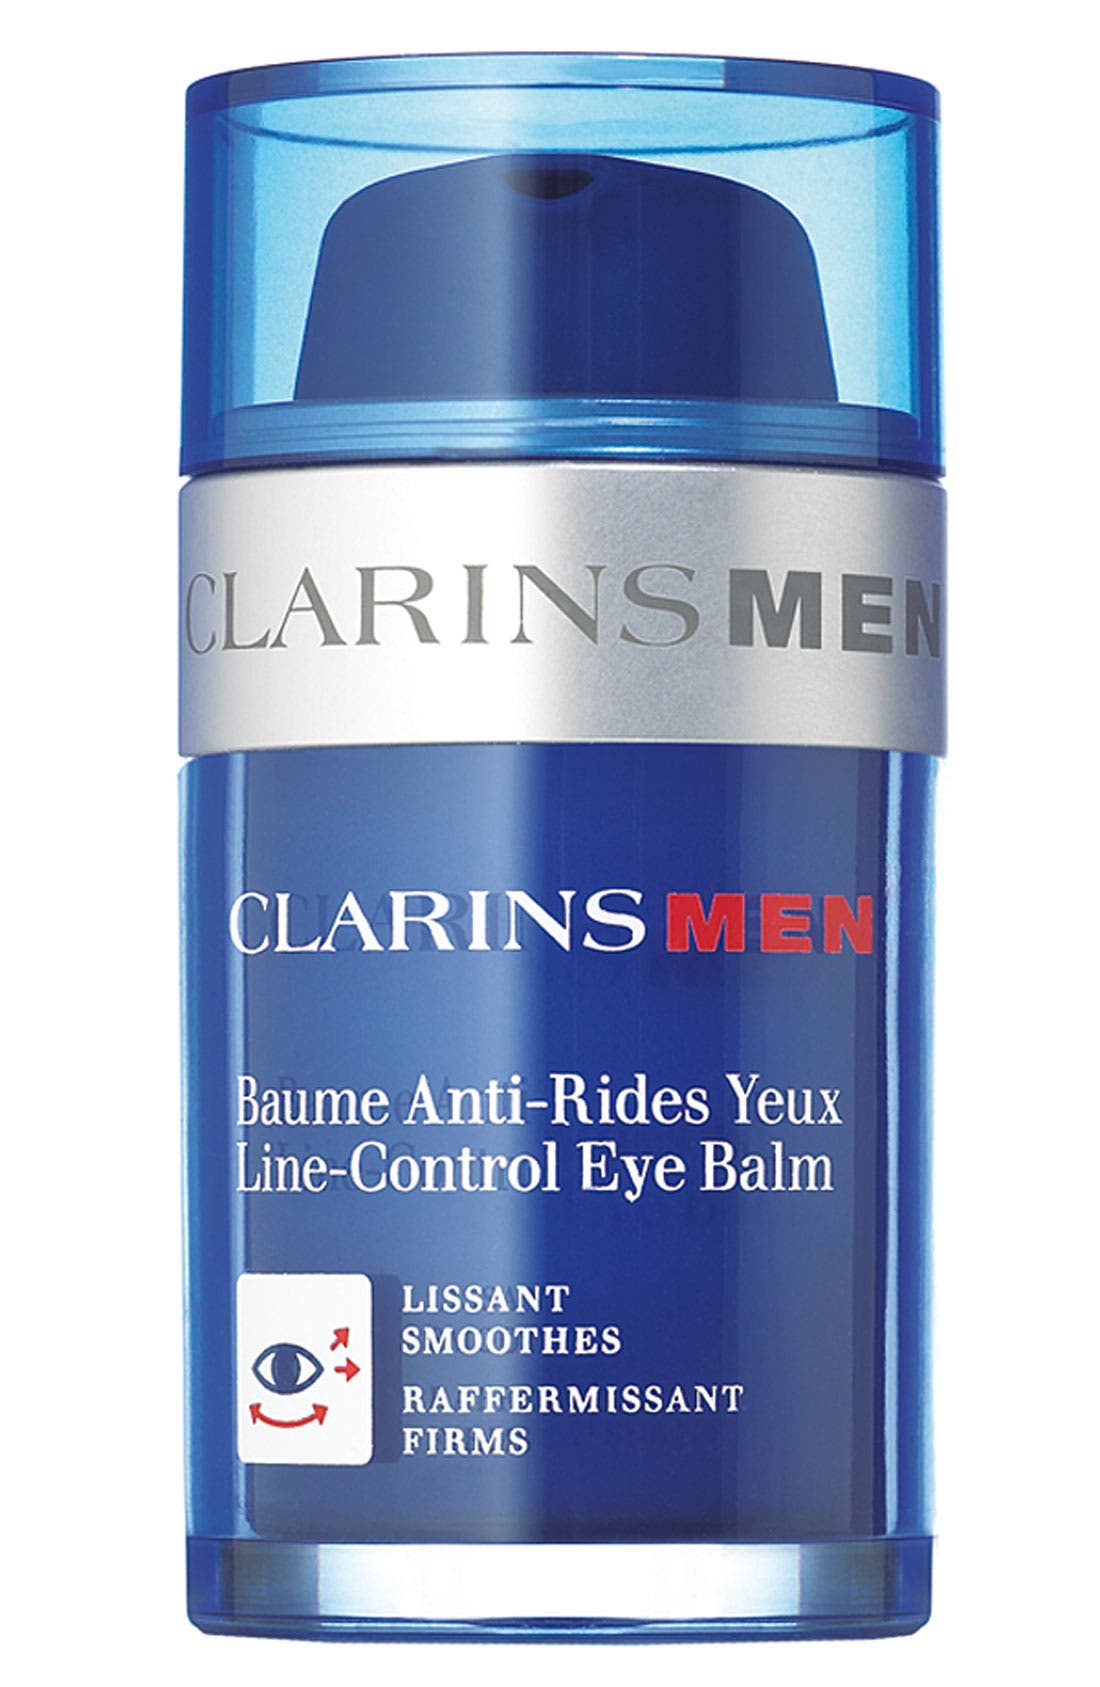 Clarins Men Line Control Eye Balm